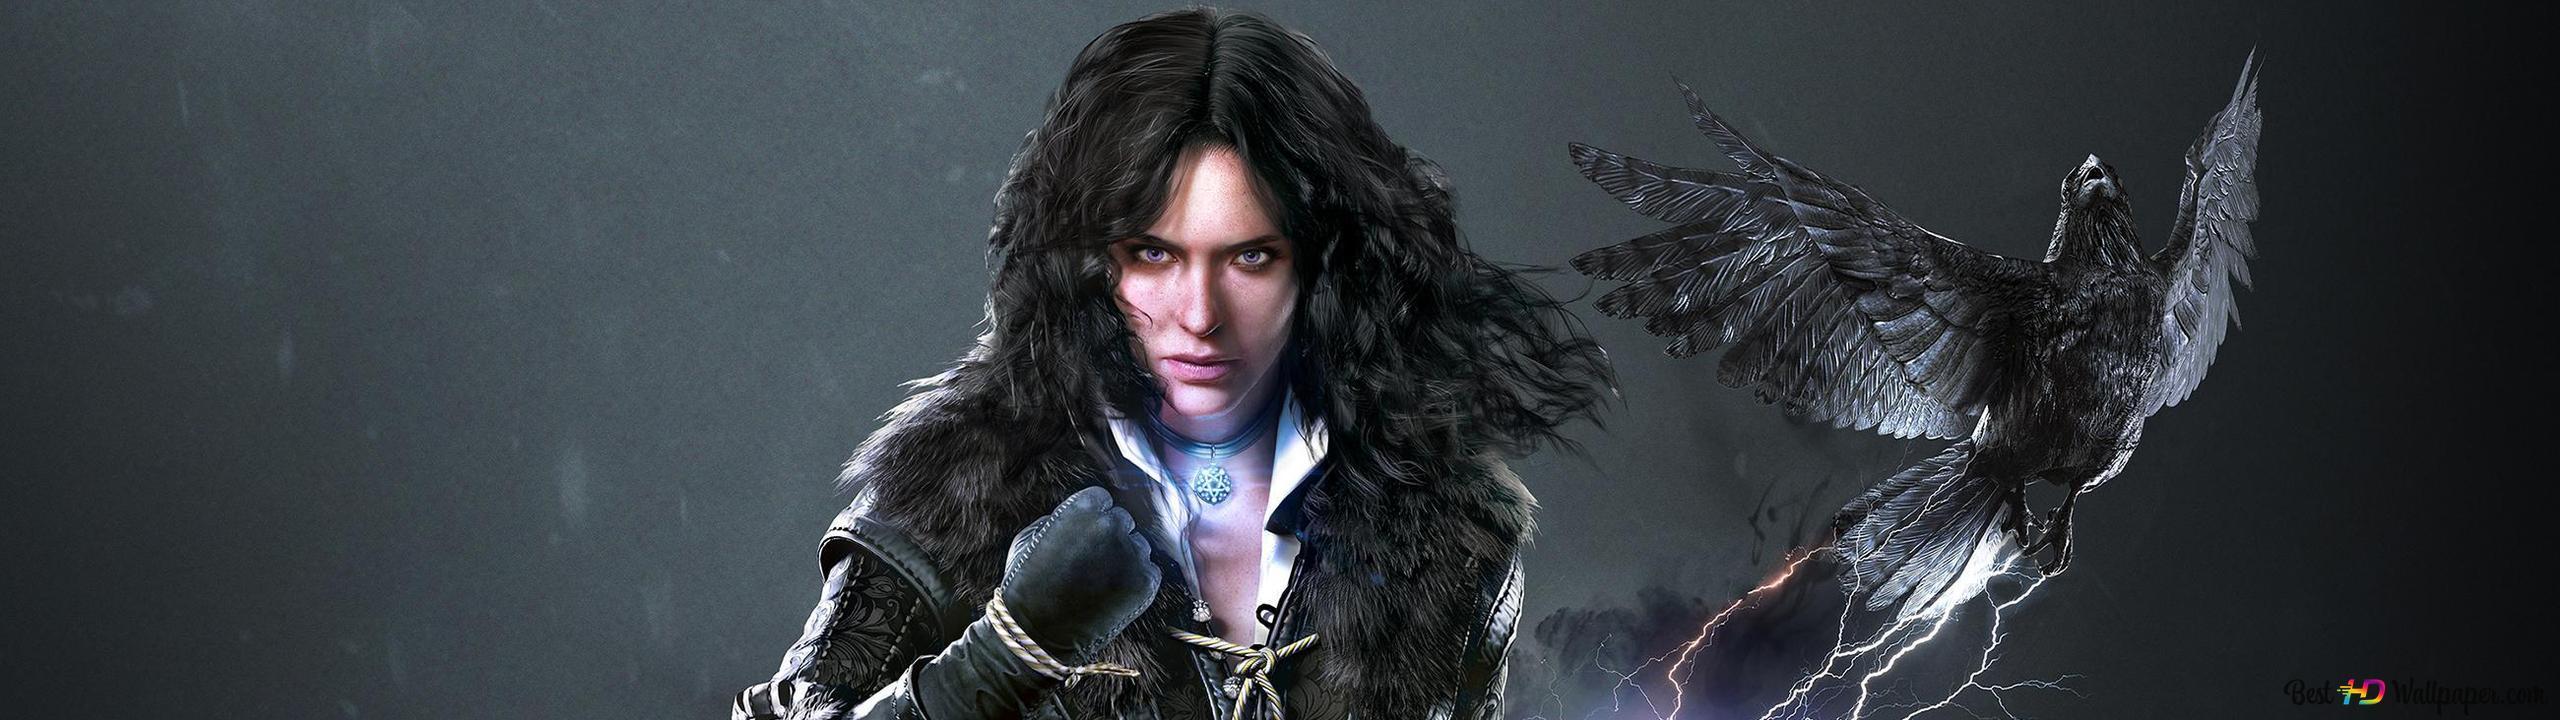 The Witcher 3 Wild Hunt Yennefer Digitale Kunst Hd